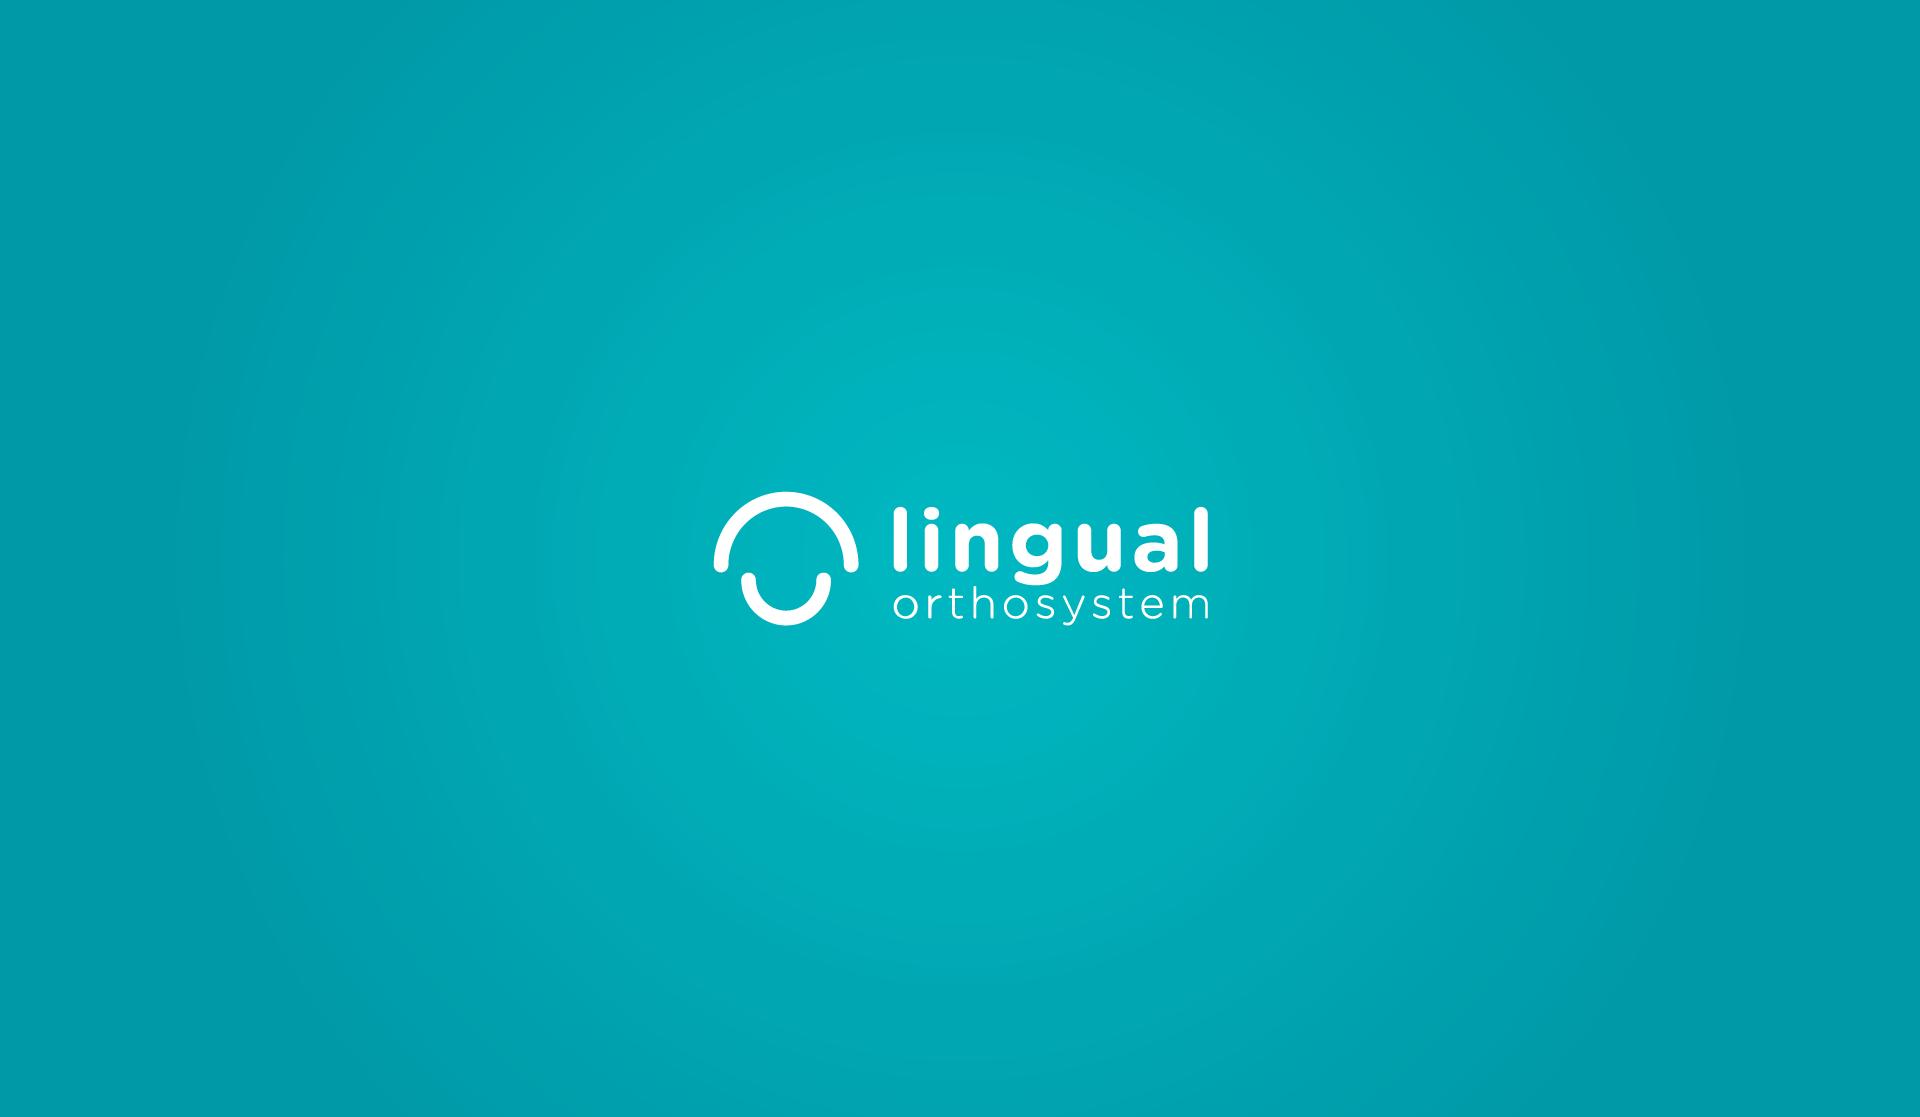 bouncy-particle-comunicazione-marketing-roma-lingual